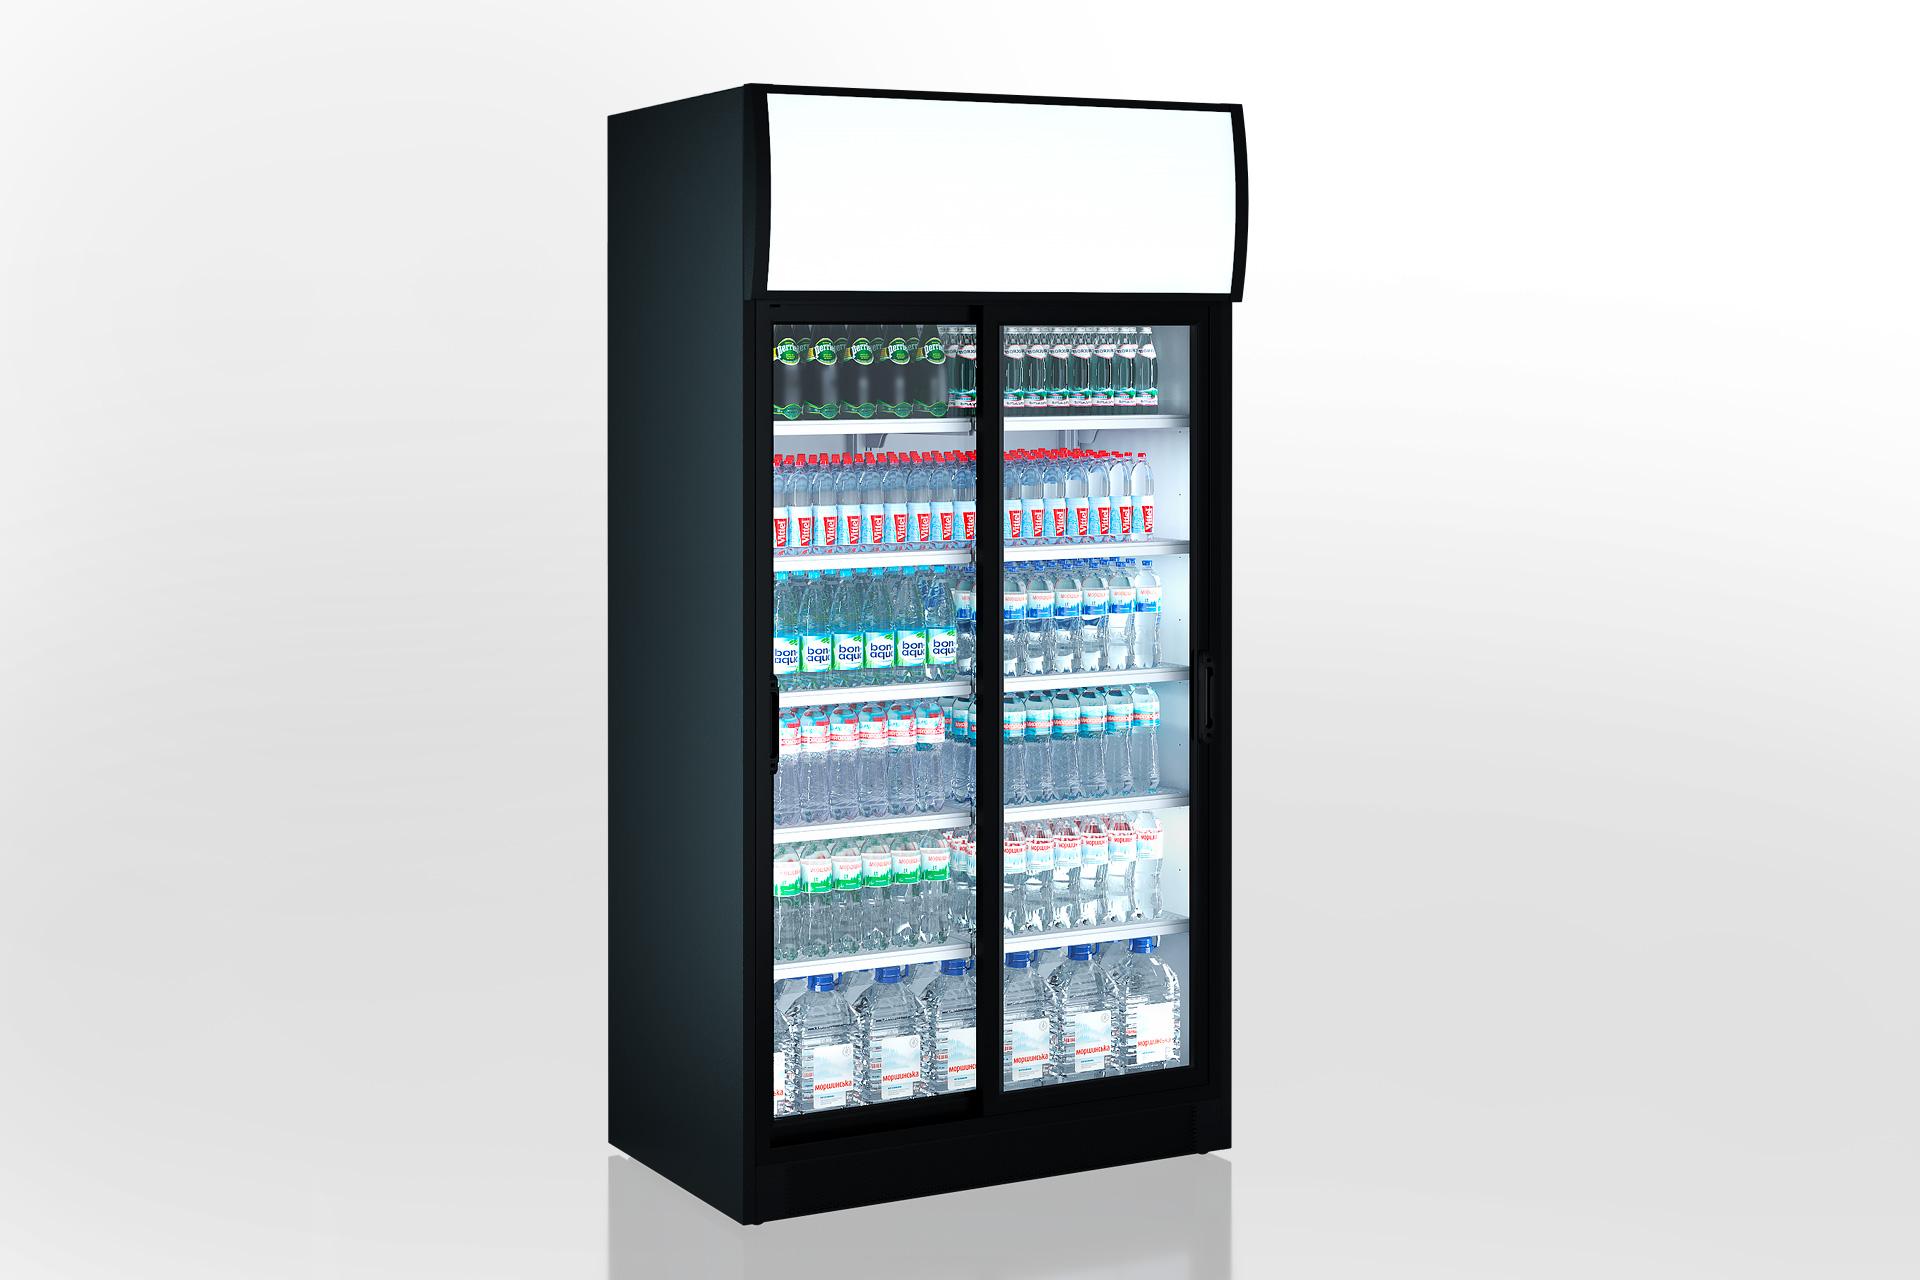 Refrigerated cabinets Kansas VА1SG 075 HT SD 245-D1500A-127